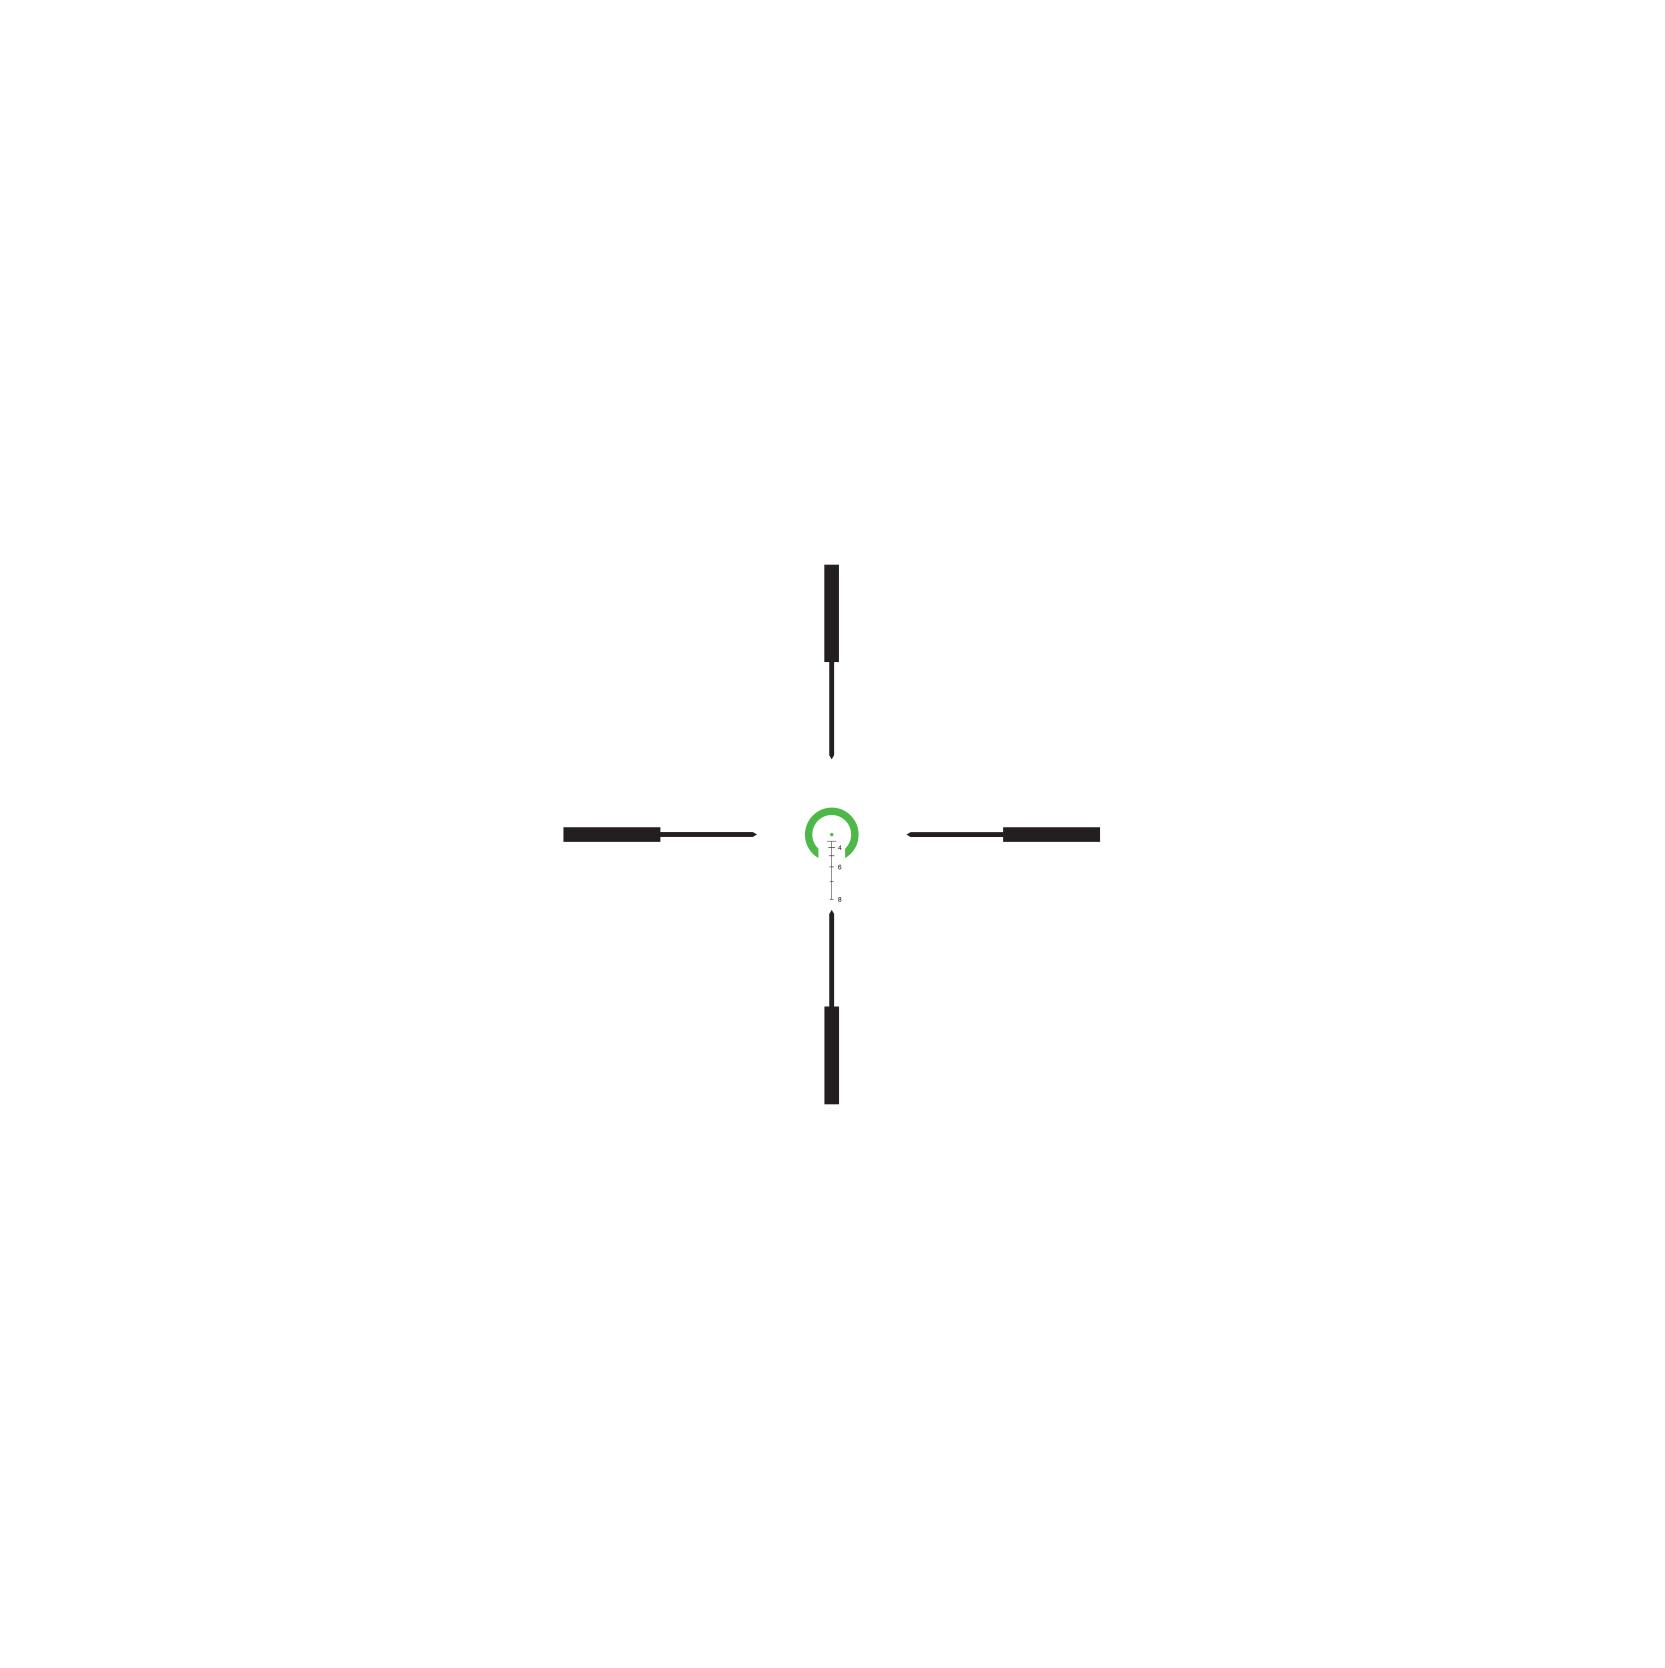 Trijicon VCOG<sup>®</sup> 1-6x24 LED Riflescope - .223 / 55 Grain RETICLE